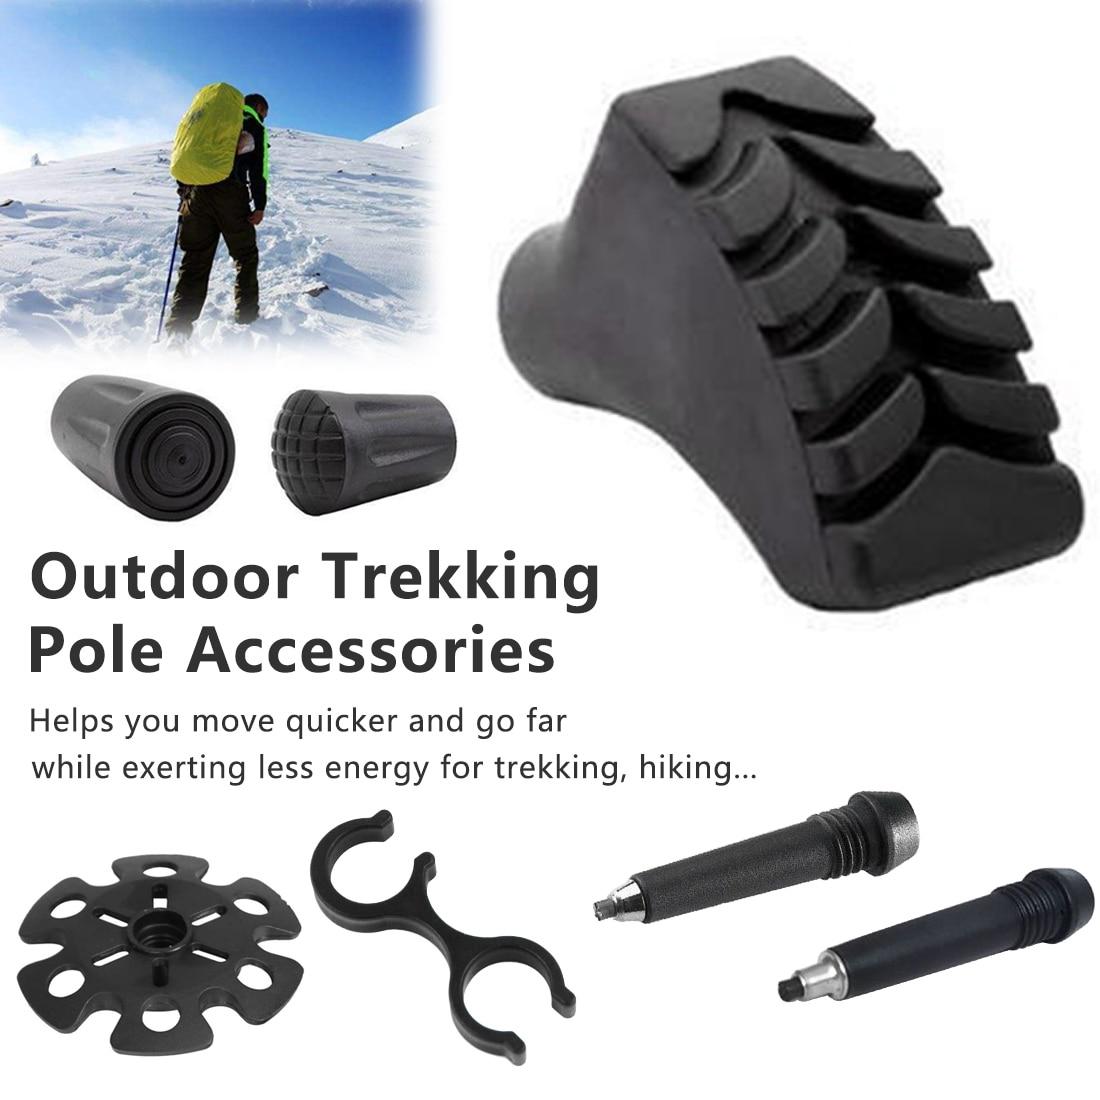 Pack of 5 Trekking Walking Stick Snowflake Basket Tip End Cap Hiking Pole Accessories